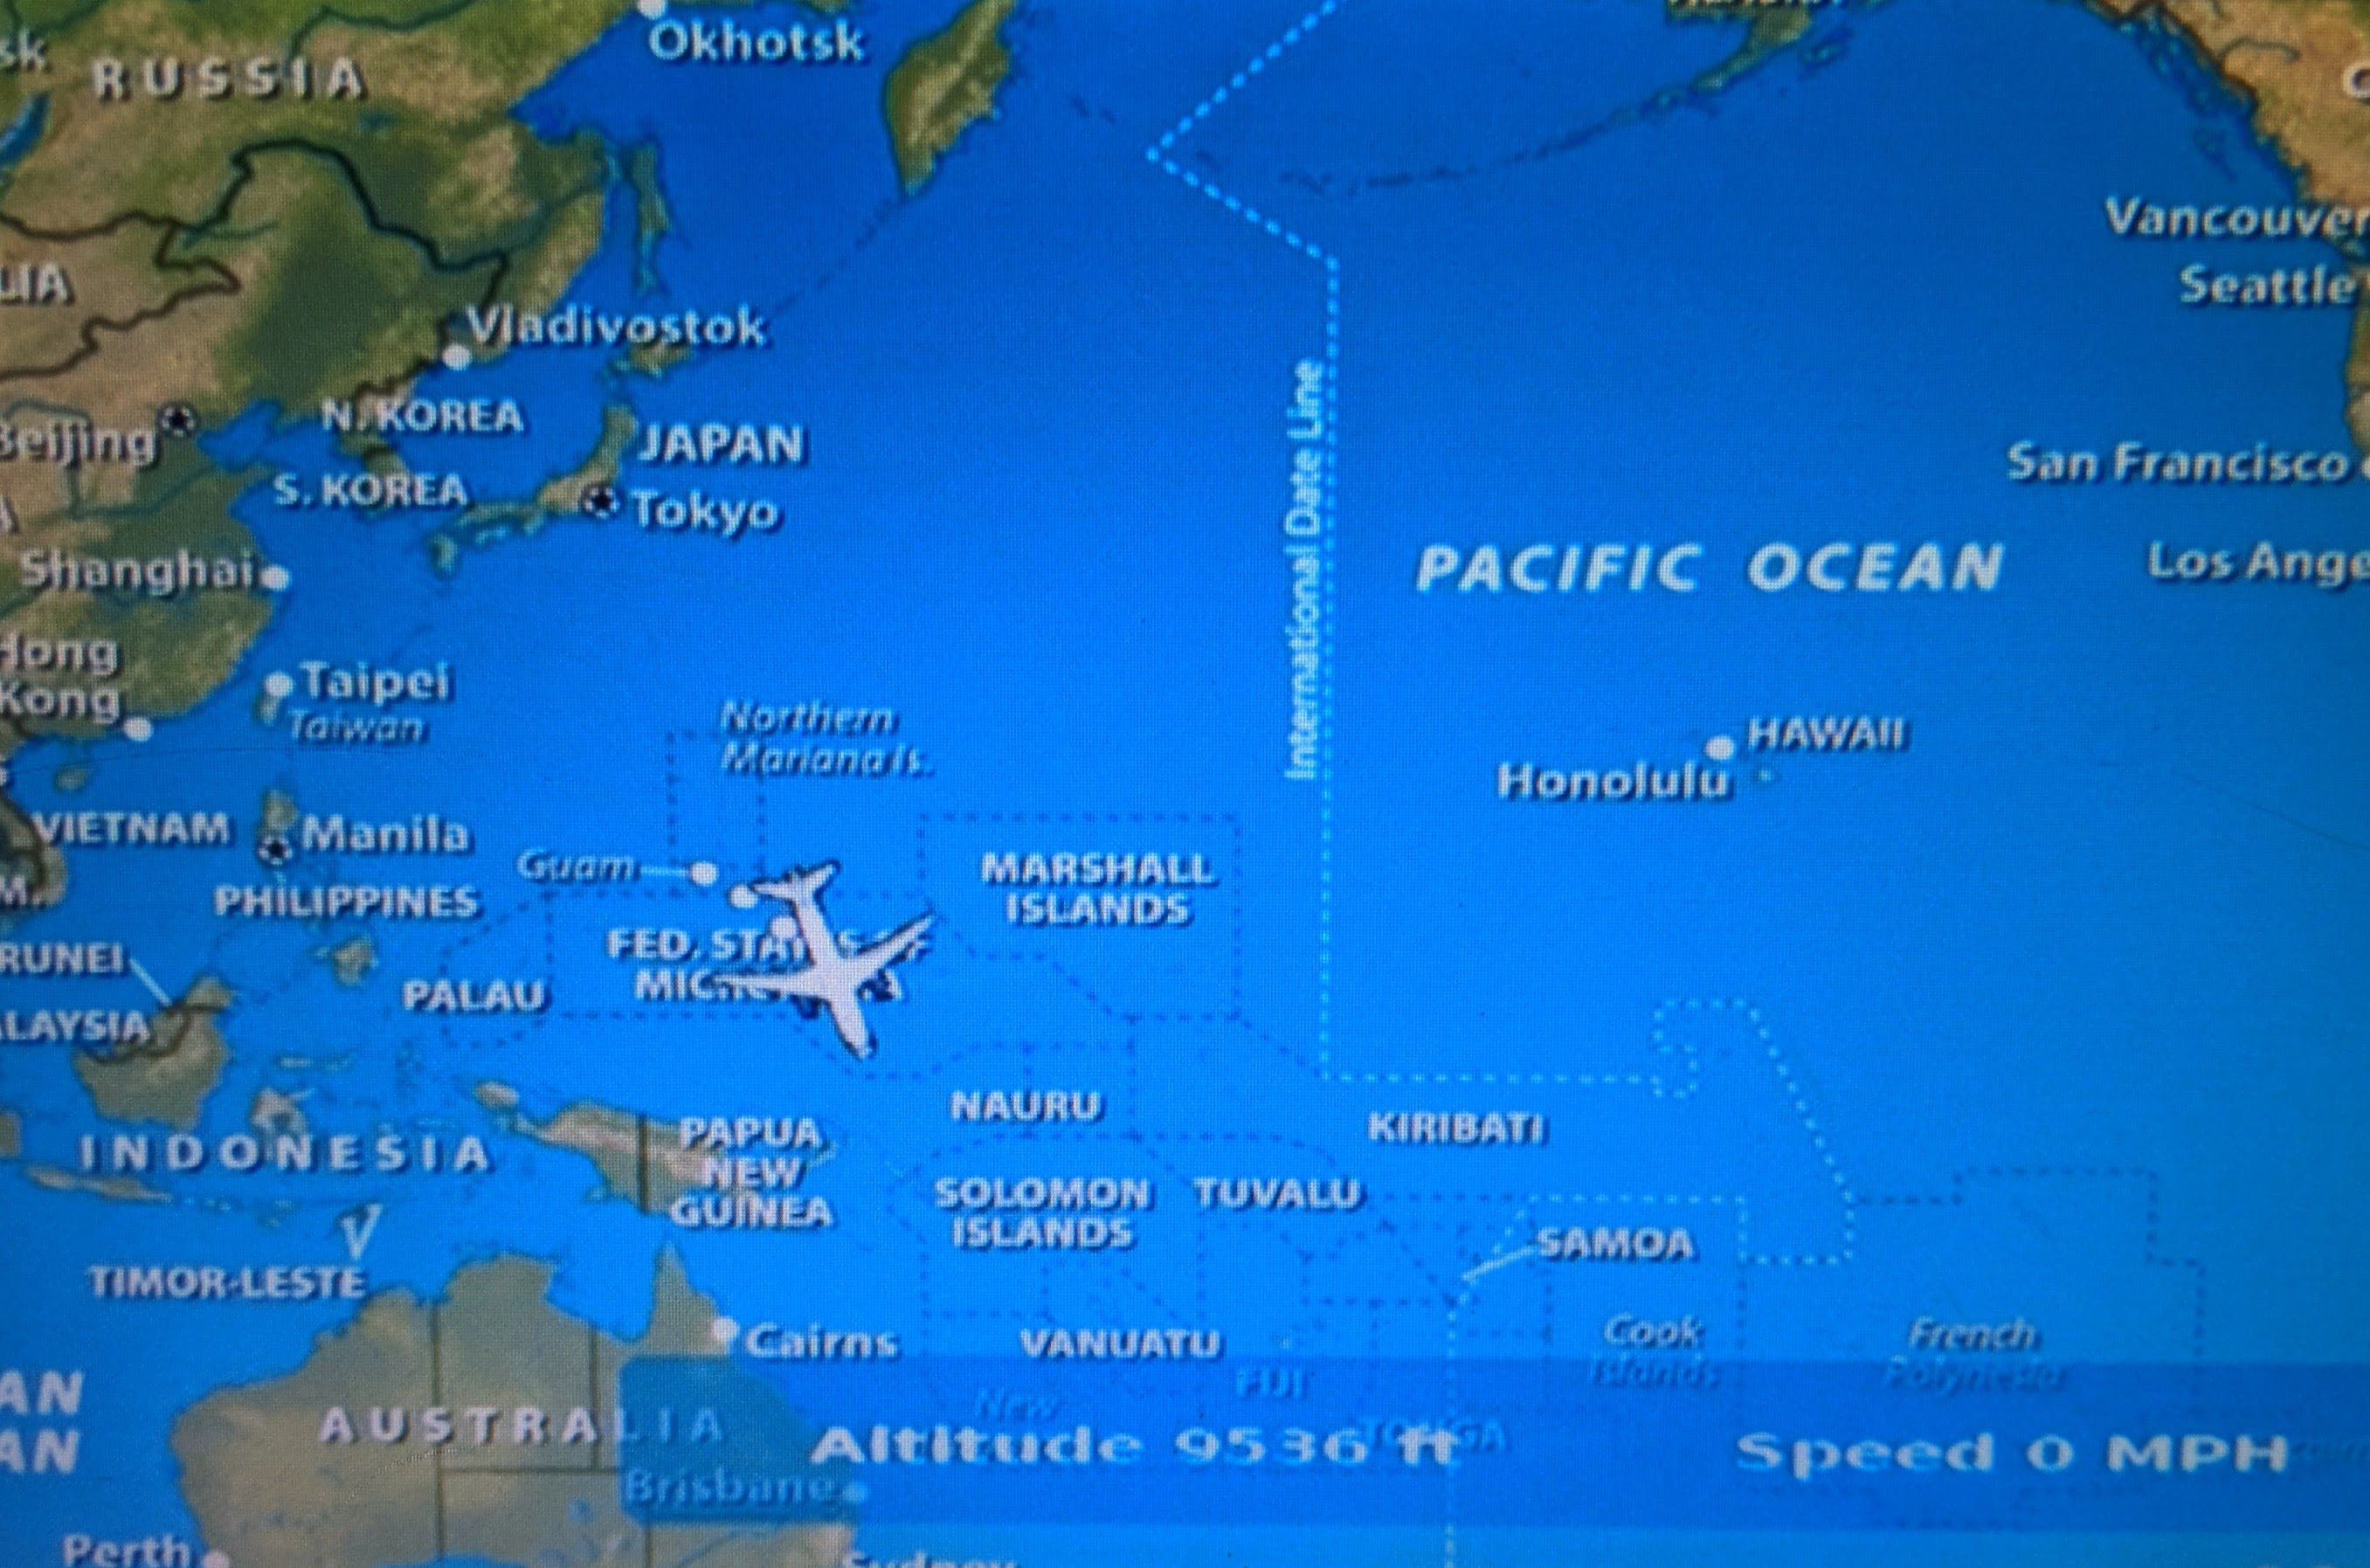 Guam Spanish Occupation